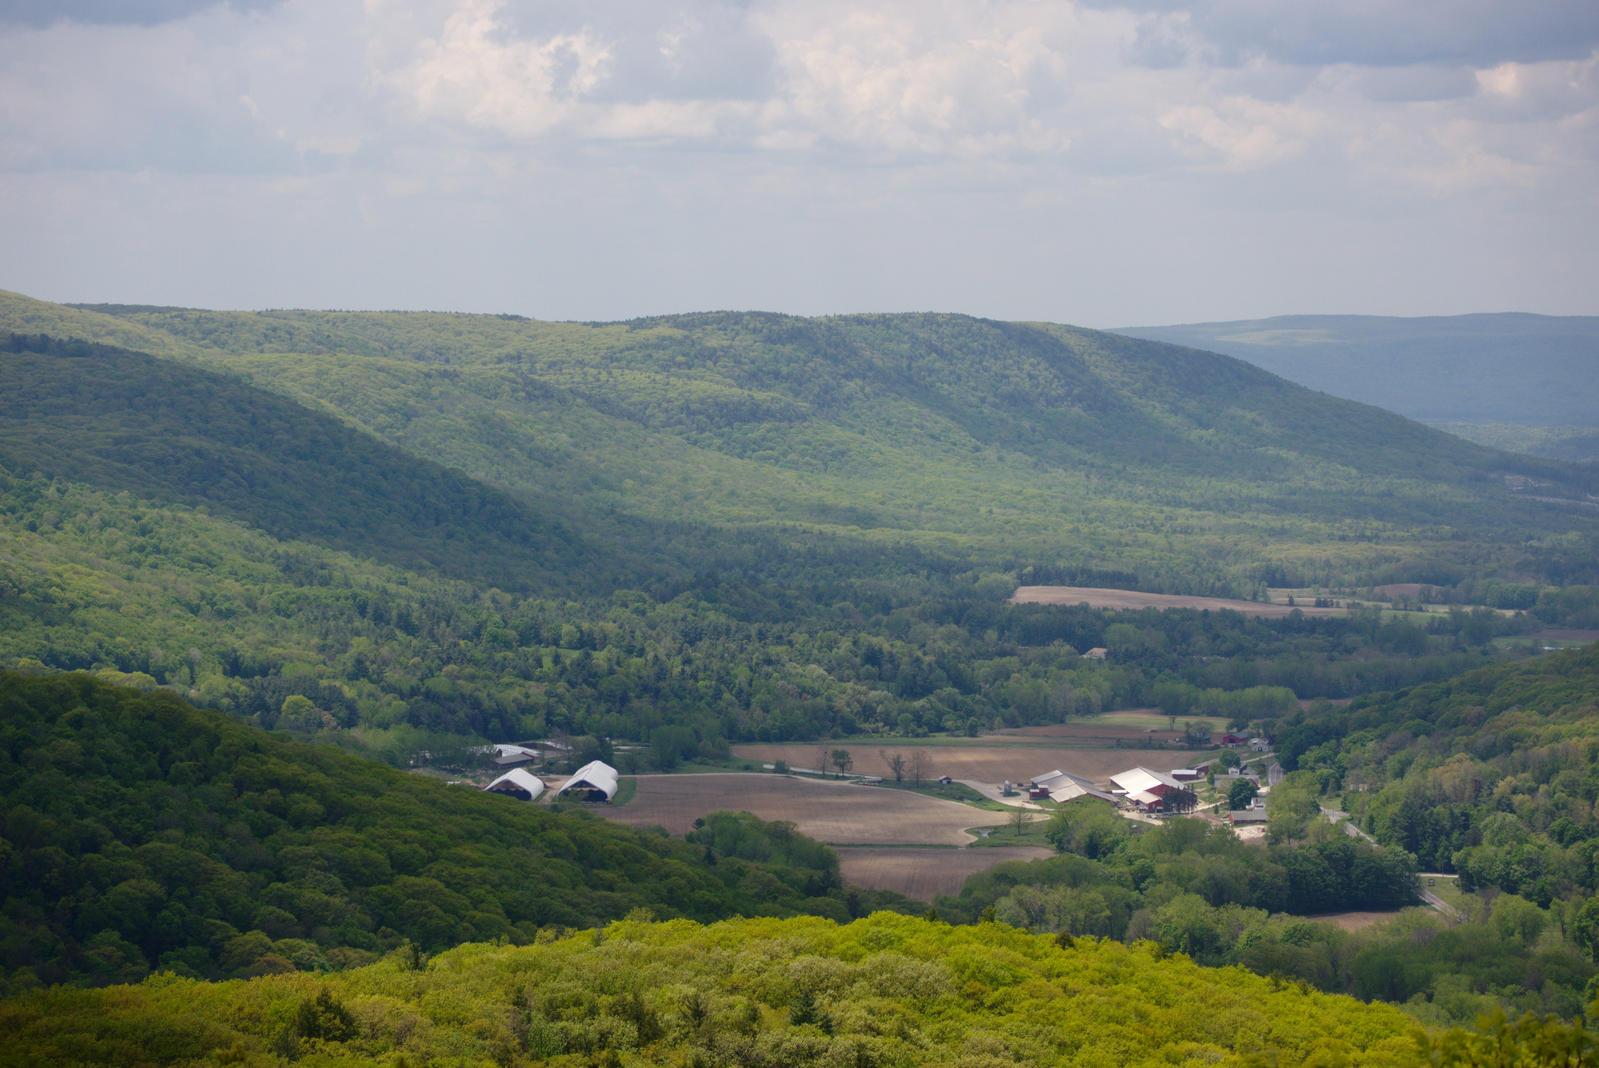 Valley Farm by dseomn